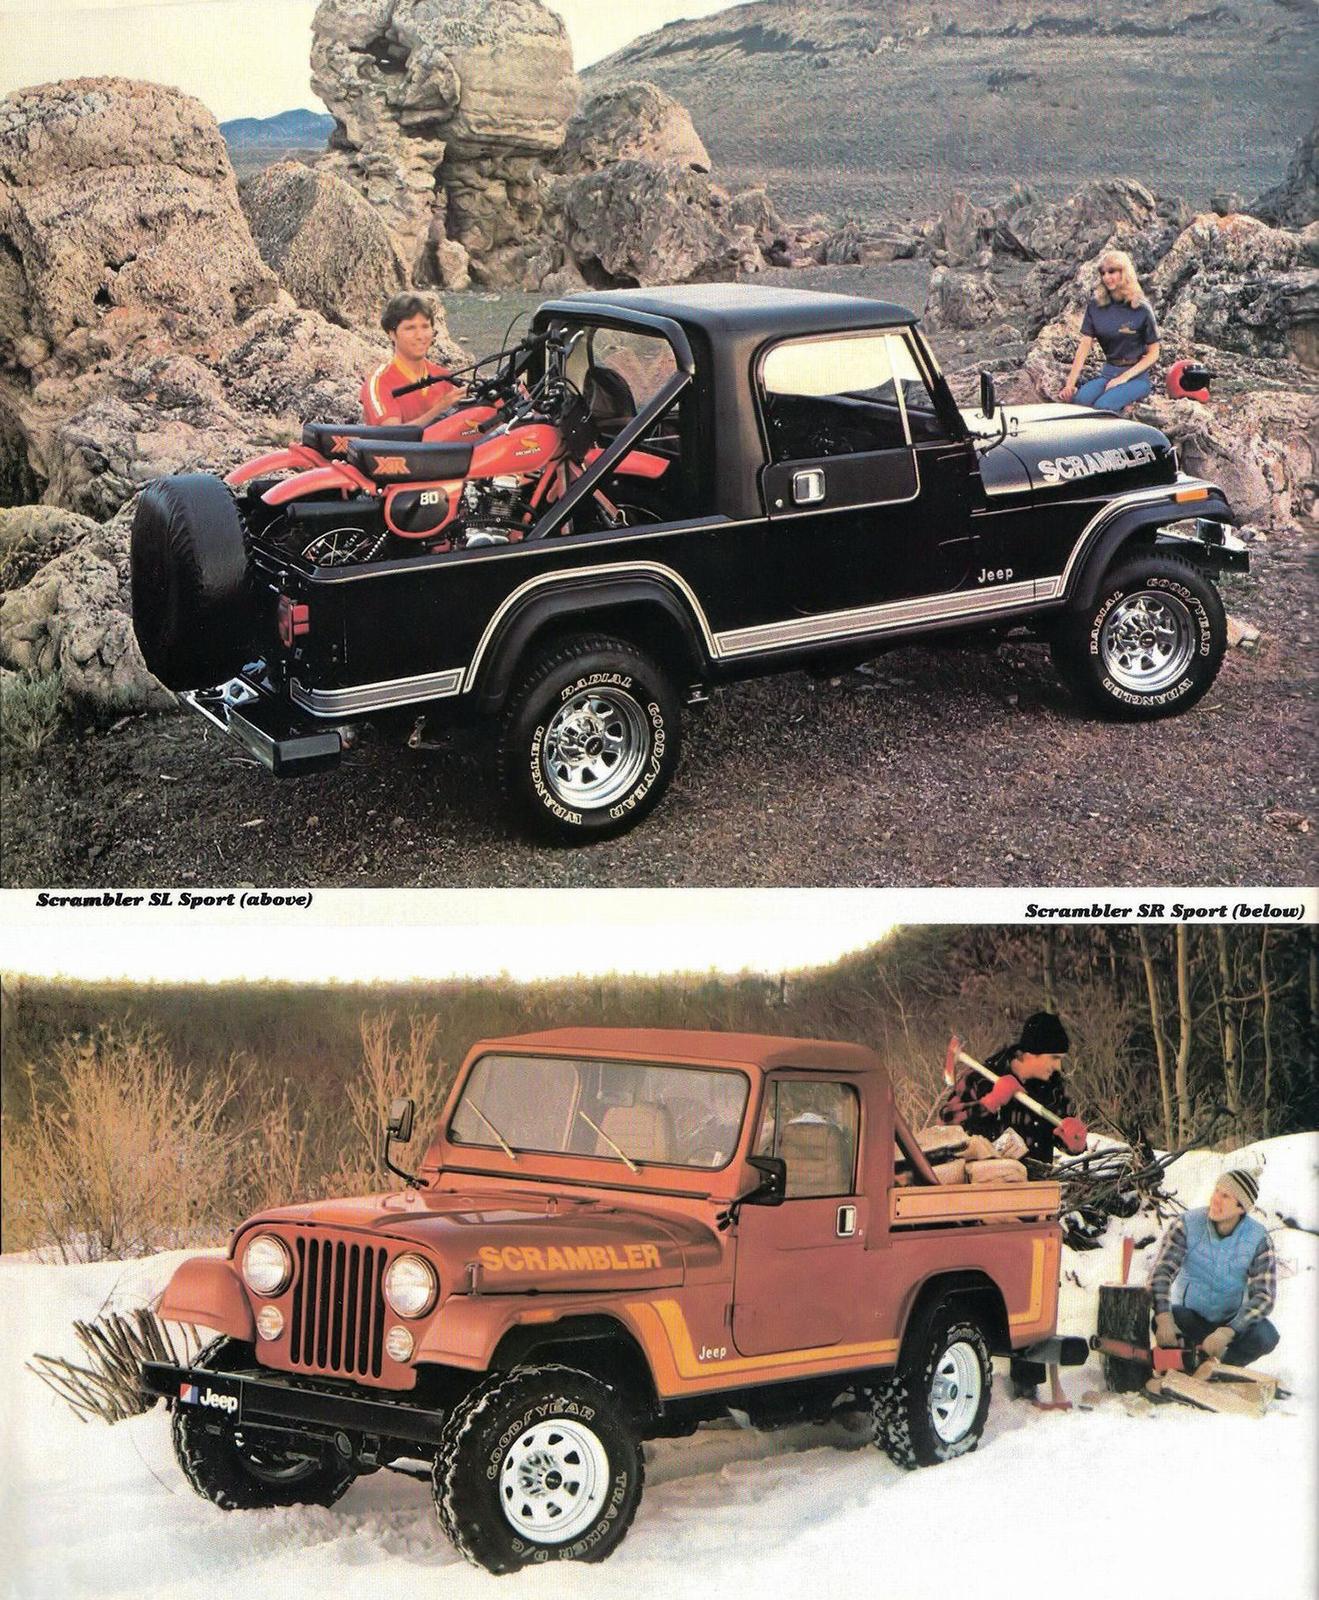 1982 Jeep Cj 8 Scrambler Pickup Truck Eighties Cars